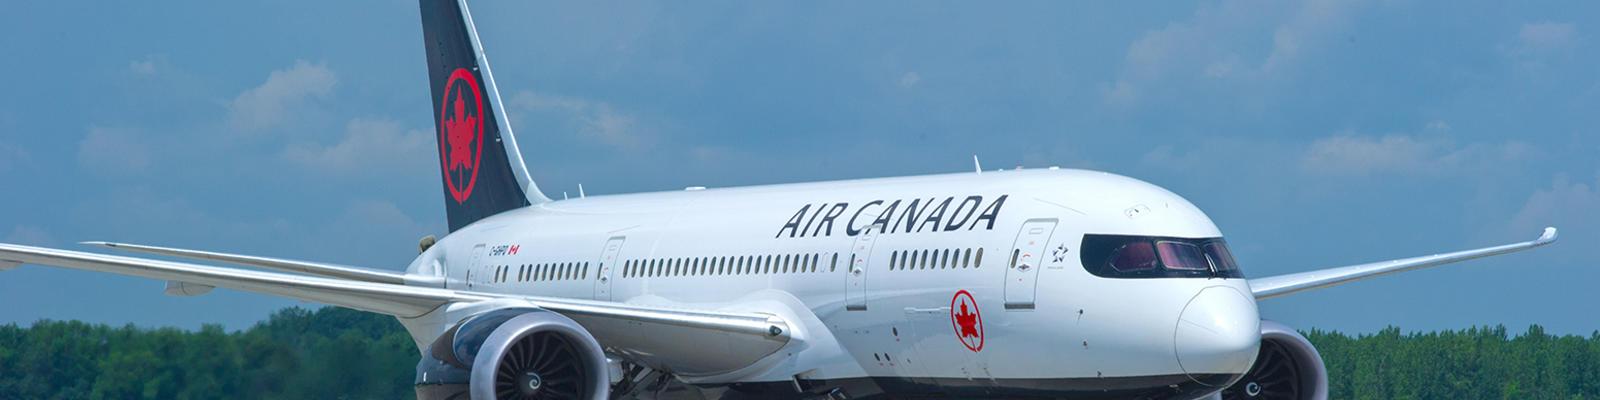 Air Canada Boeing 787-8 Dreamliner aircraft on runway